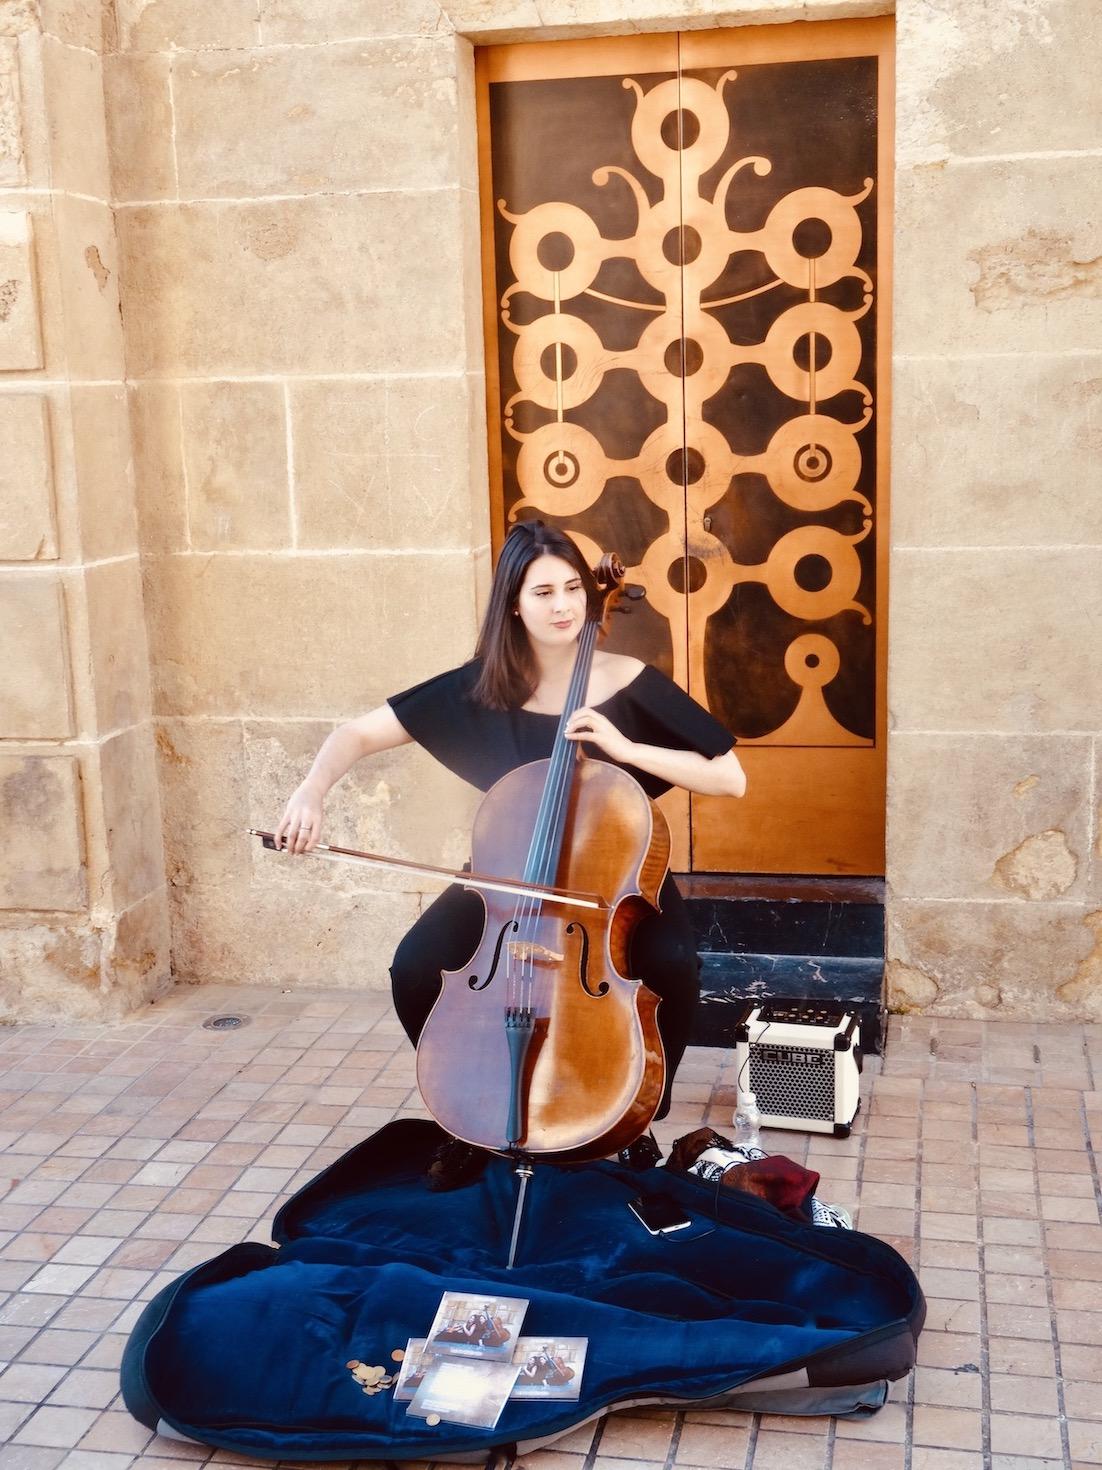 Celloist in Cordoba Spain.